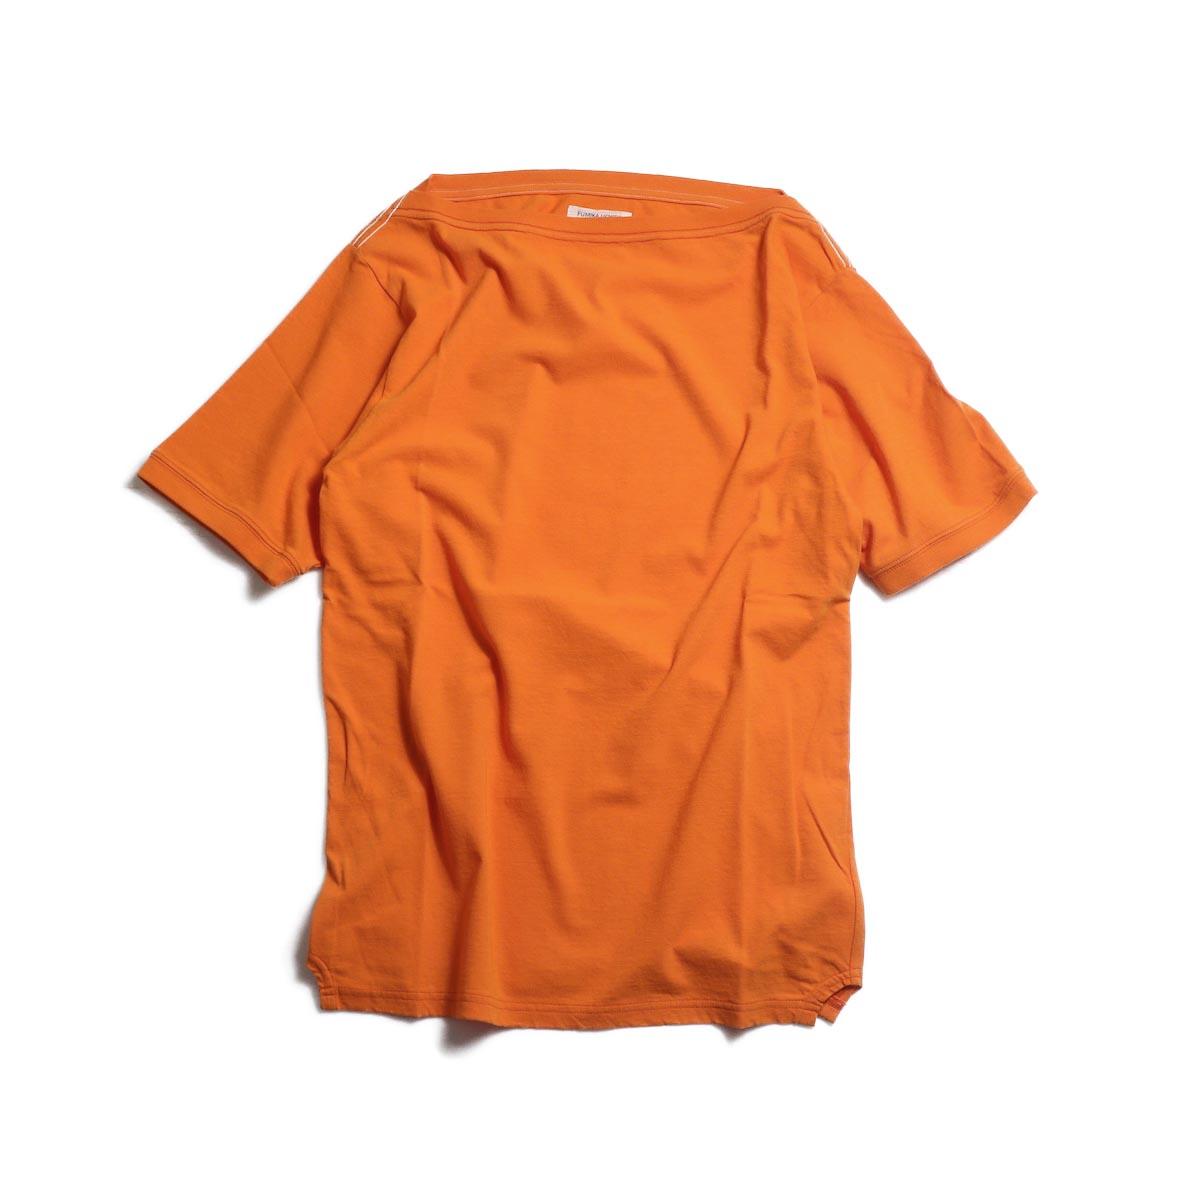 FUMIKA UCHIDA / Cotton Straight Neck Over Shoulder Tee -Orange